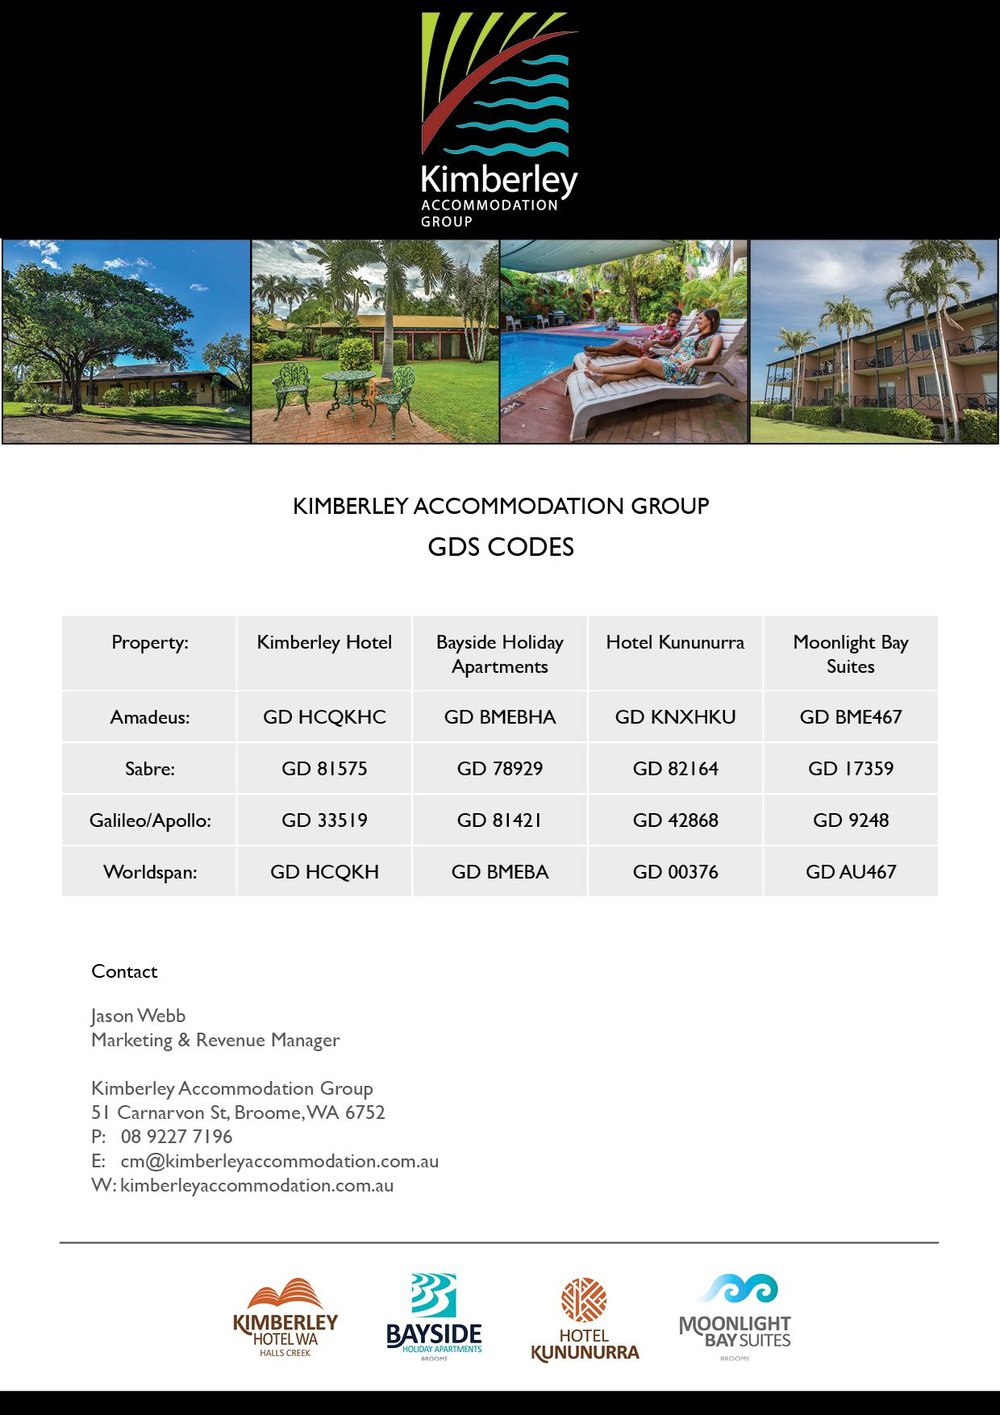 gds-codes.jpg